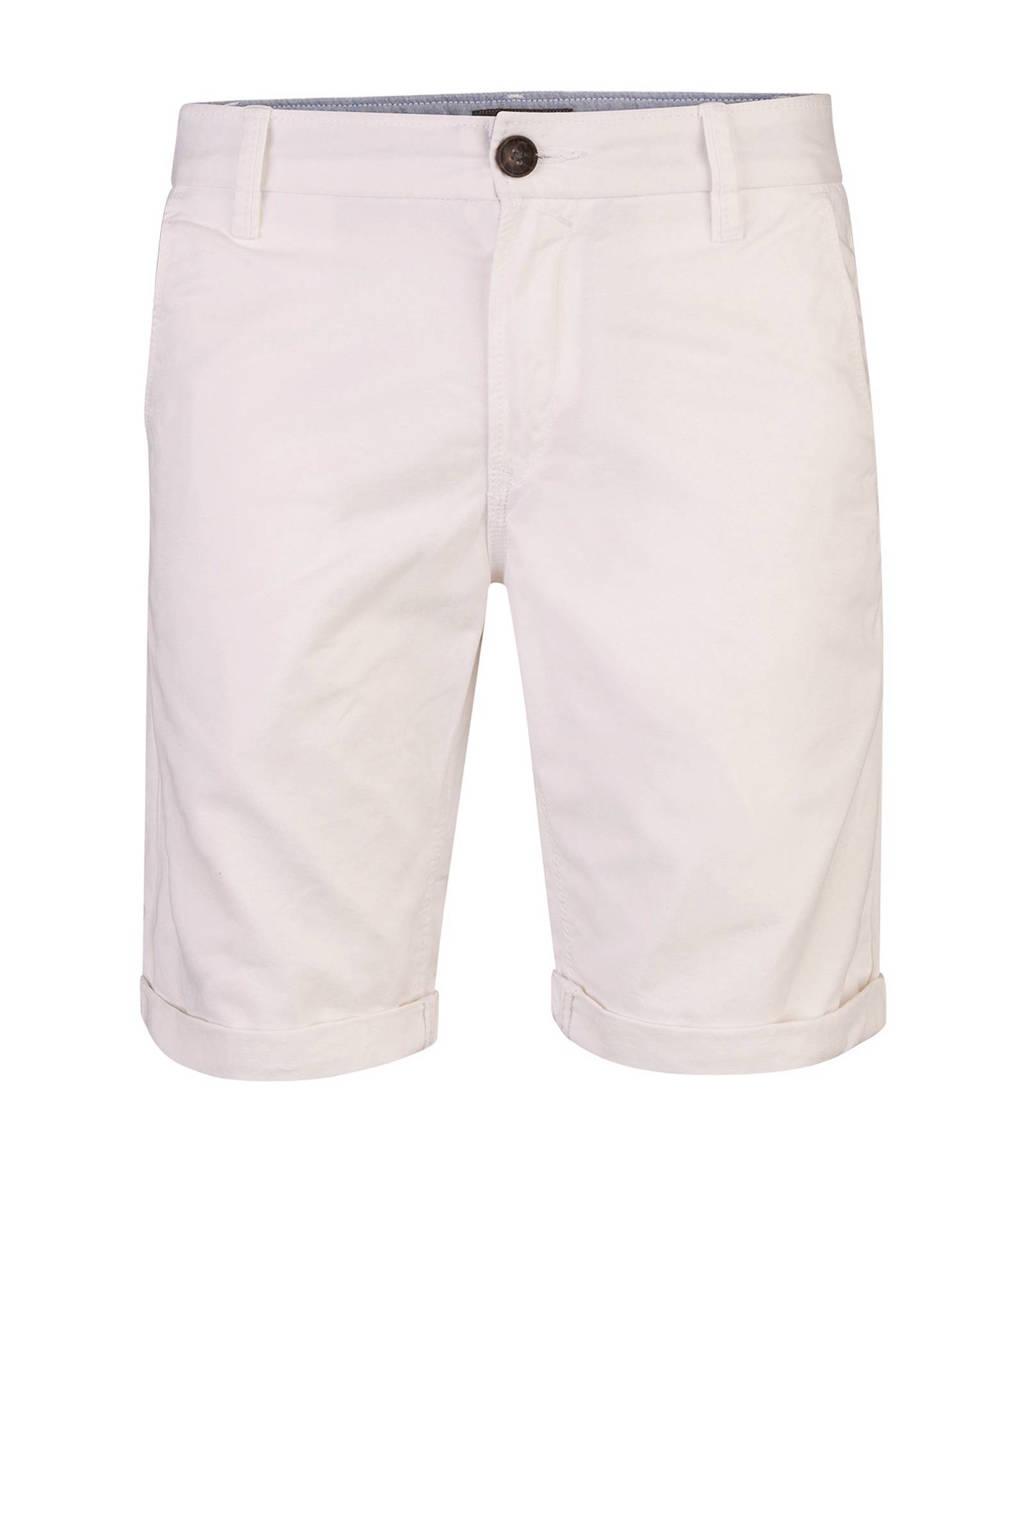 WE Fashion regular fit bermuda gebroken wit, Gebroken wit